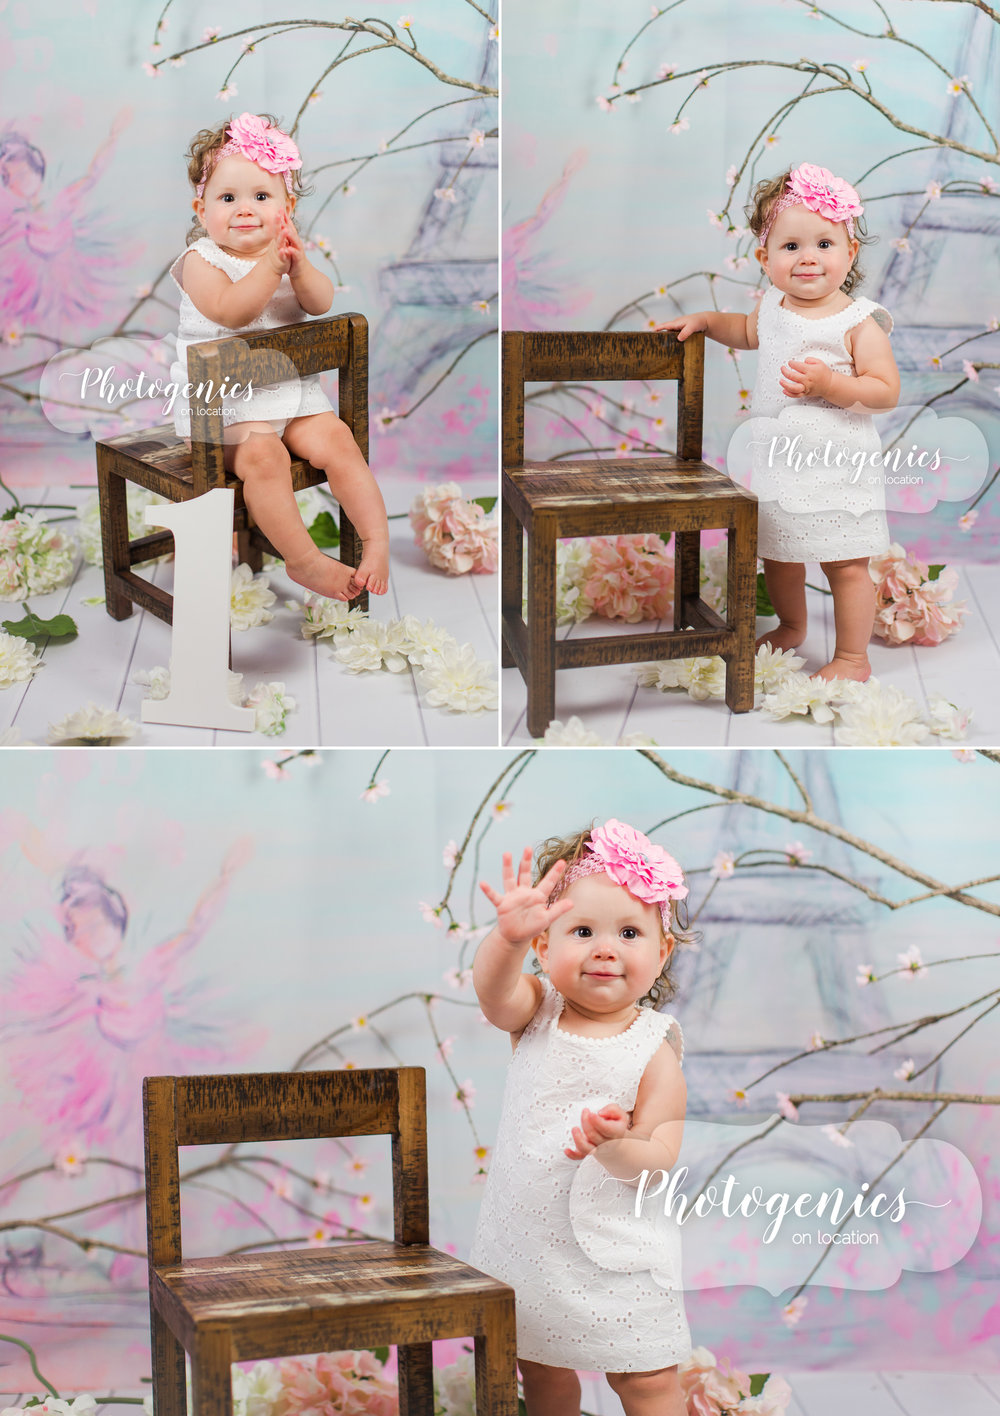 12_month_birthday_girl_cake_smash_flowers_ideas_pink_teal_set 1.jpg